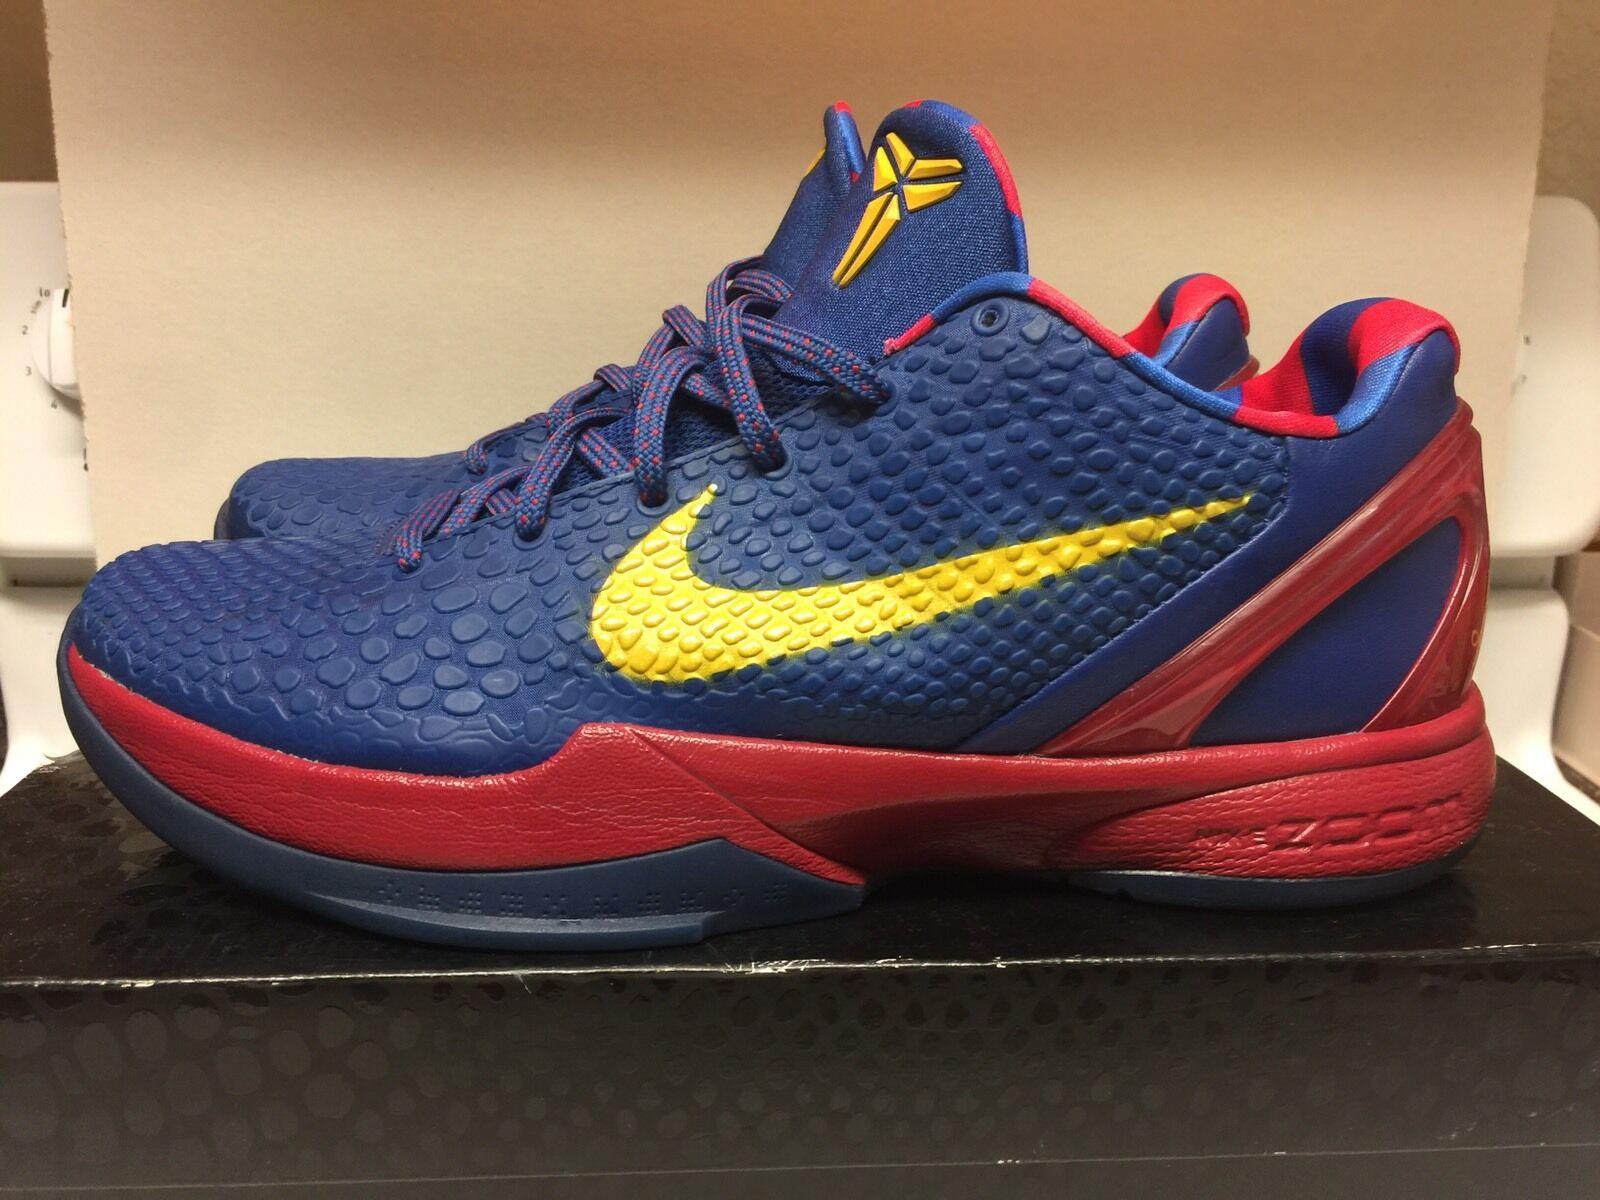 Nike Zoom Kobe VI 6 Barcelona Home FC barca Sz 11 429659-402 Euro Release Grinch Seasonal price cuts, discount benefits